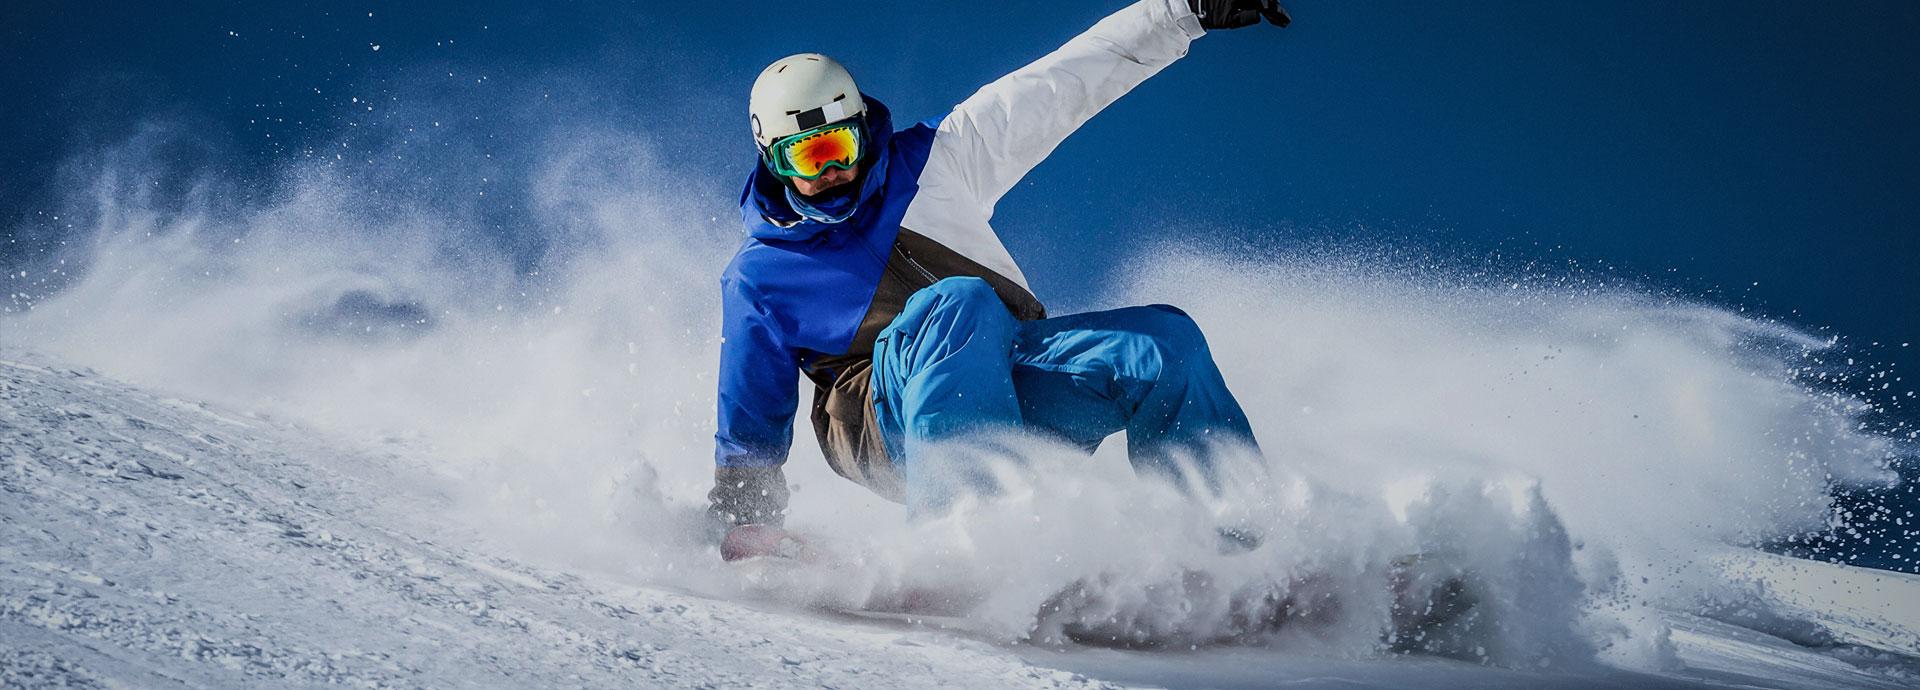 Оборудование для ski-сервиса